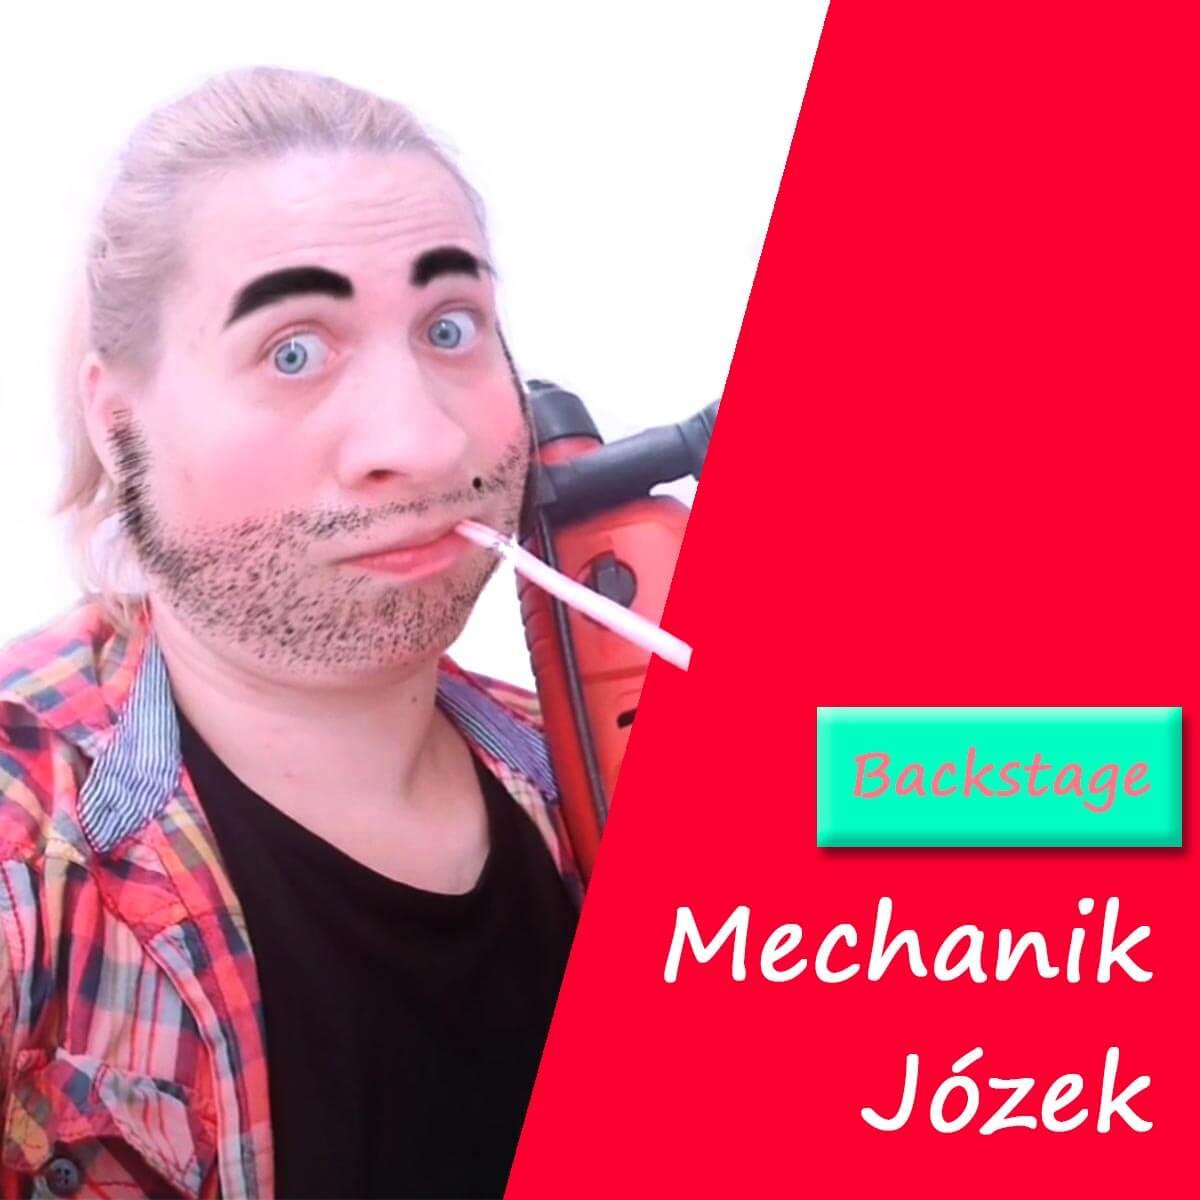 mechanik józek1